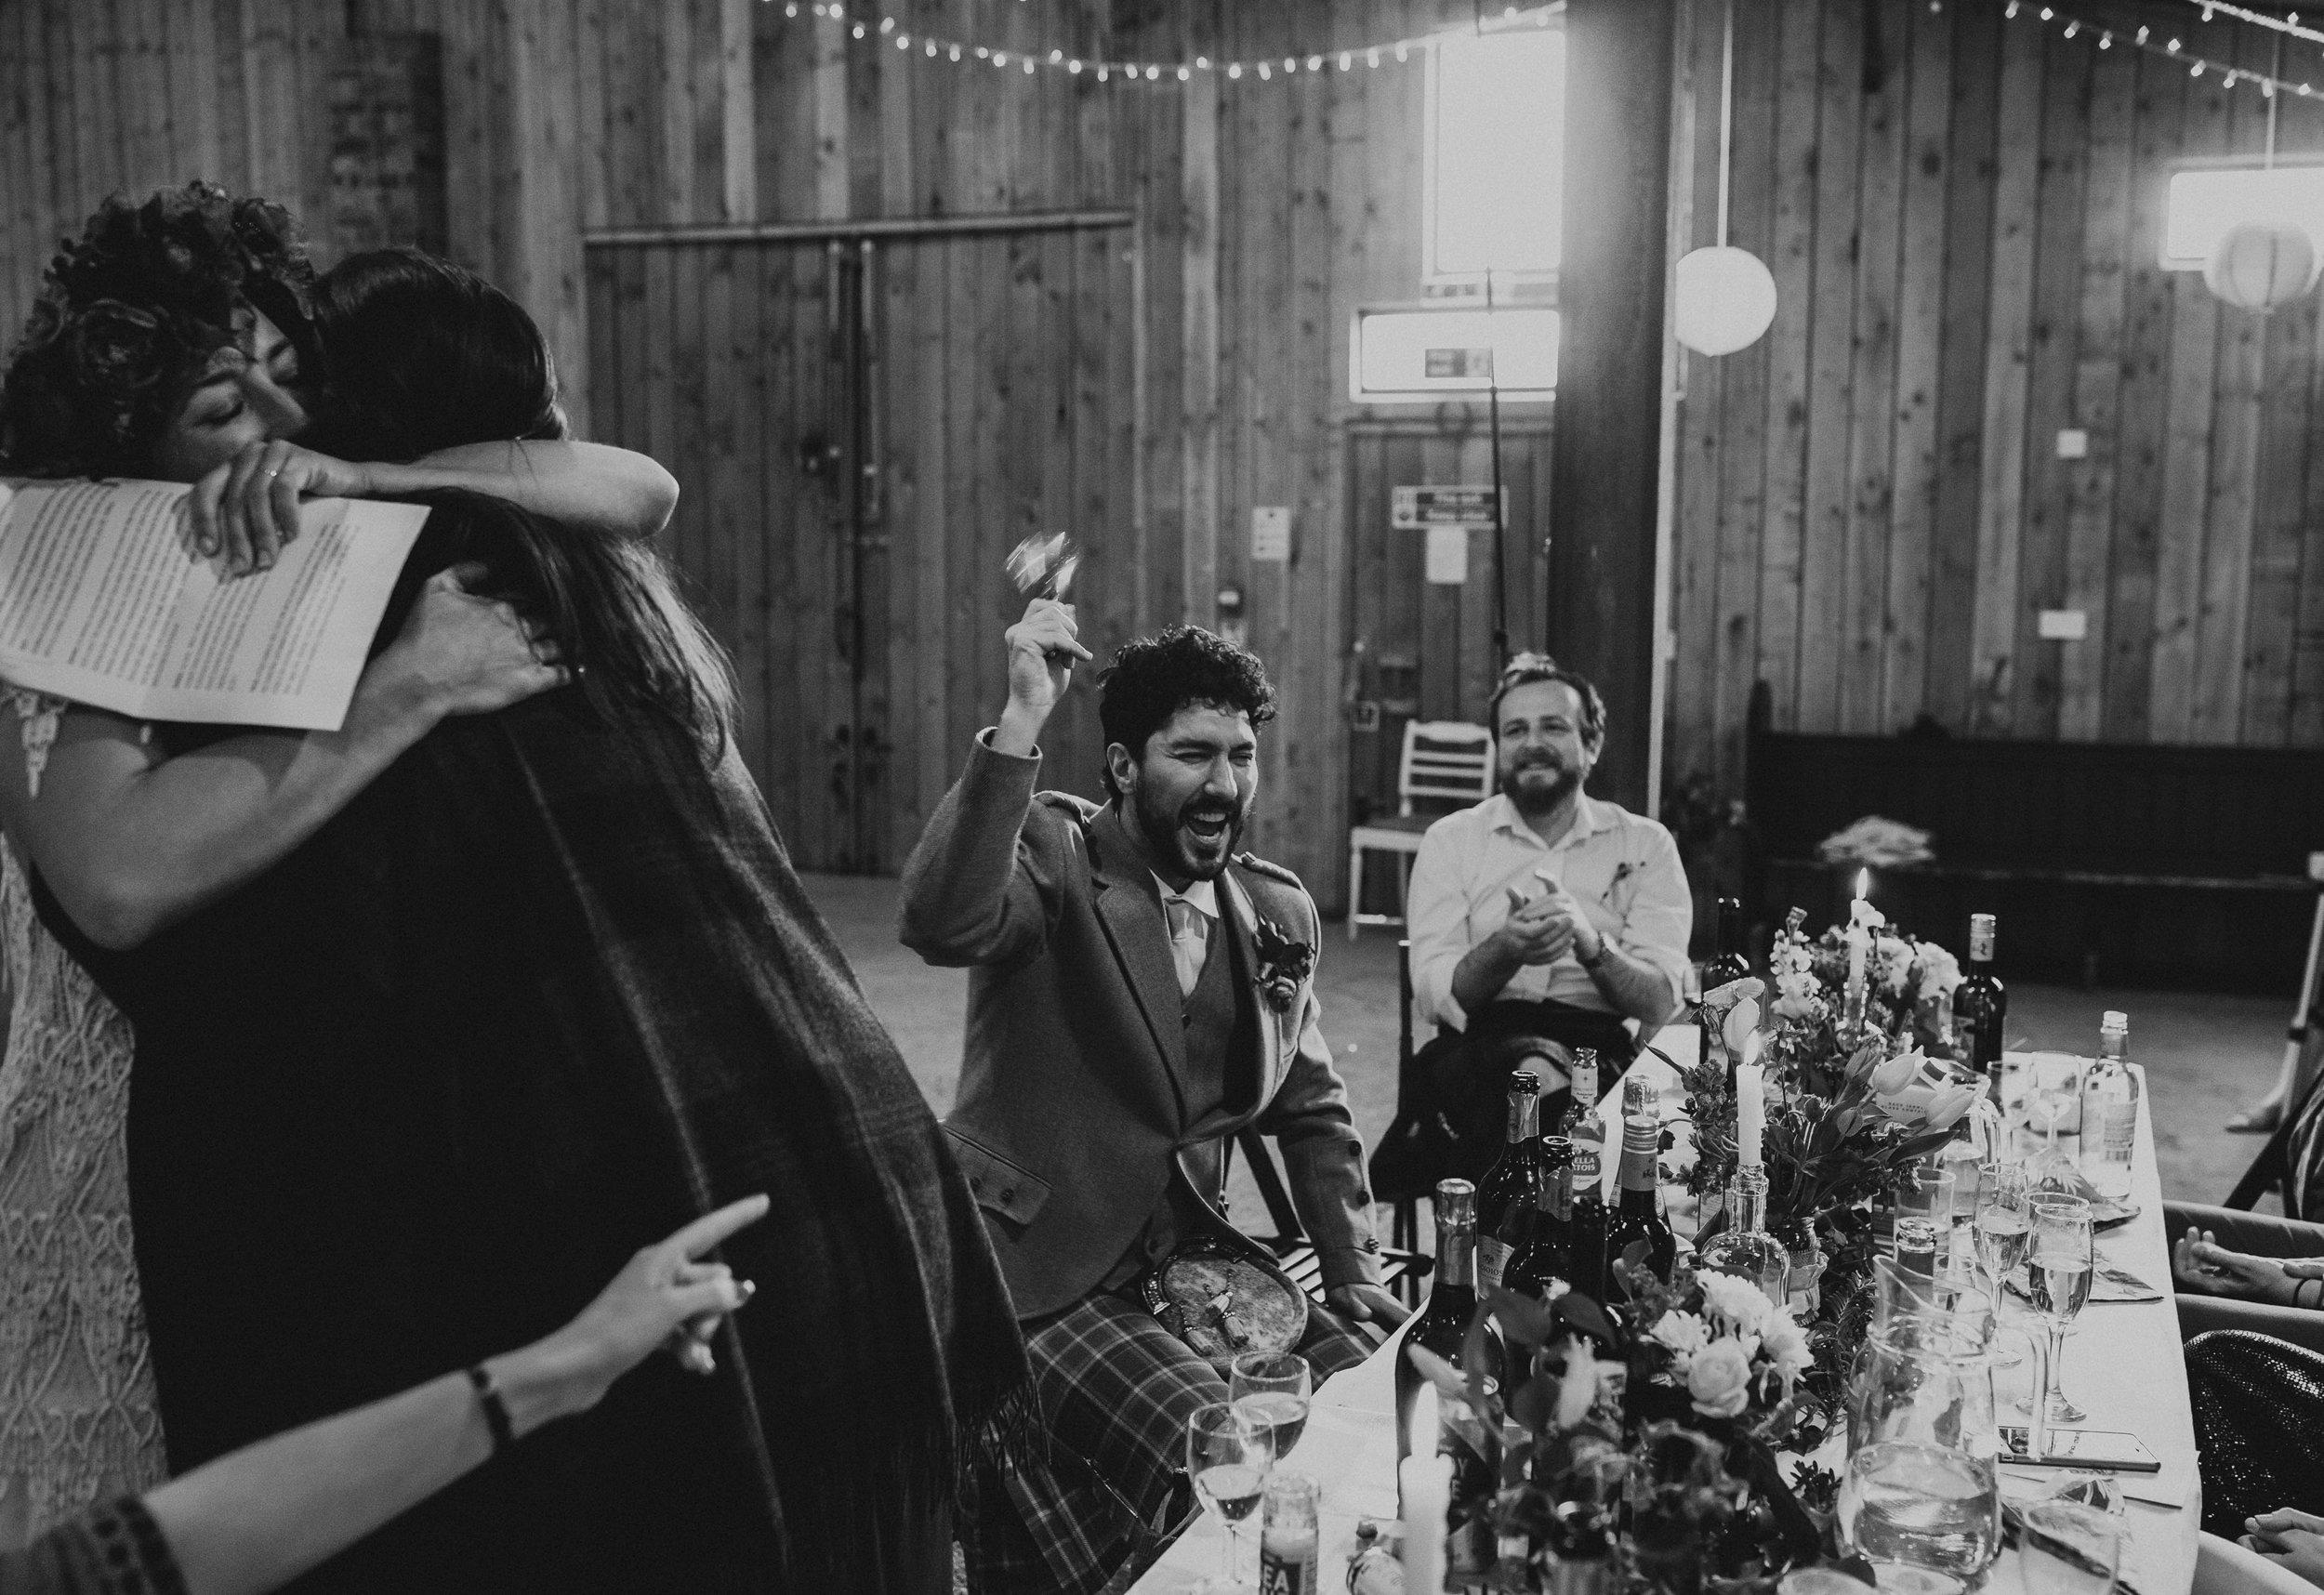 COMRIE_CROFT_WEDDINGS_PJ_PHILLIPS_PHOTOGRAPHY_159.jpg